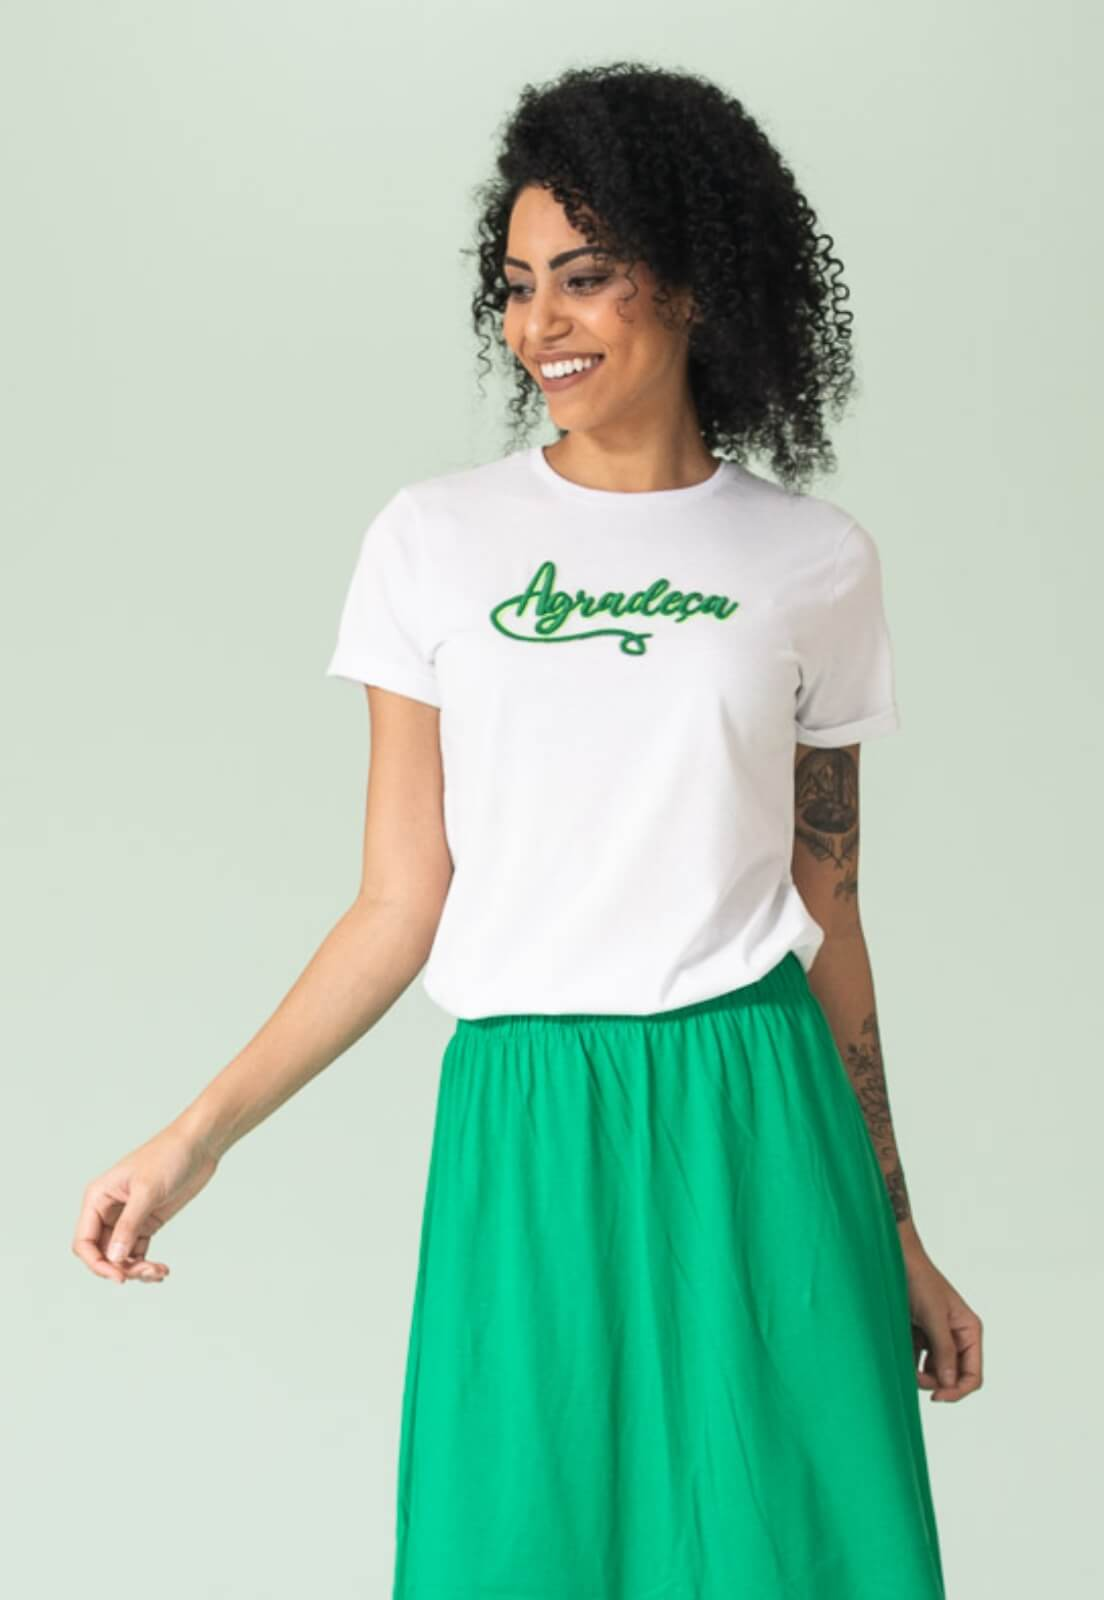 T-shirt Nogah Agradeça Branca